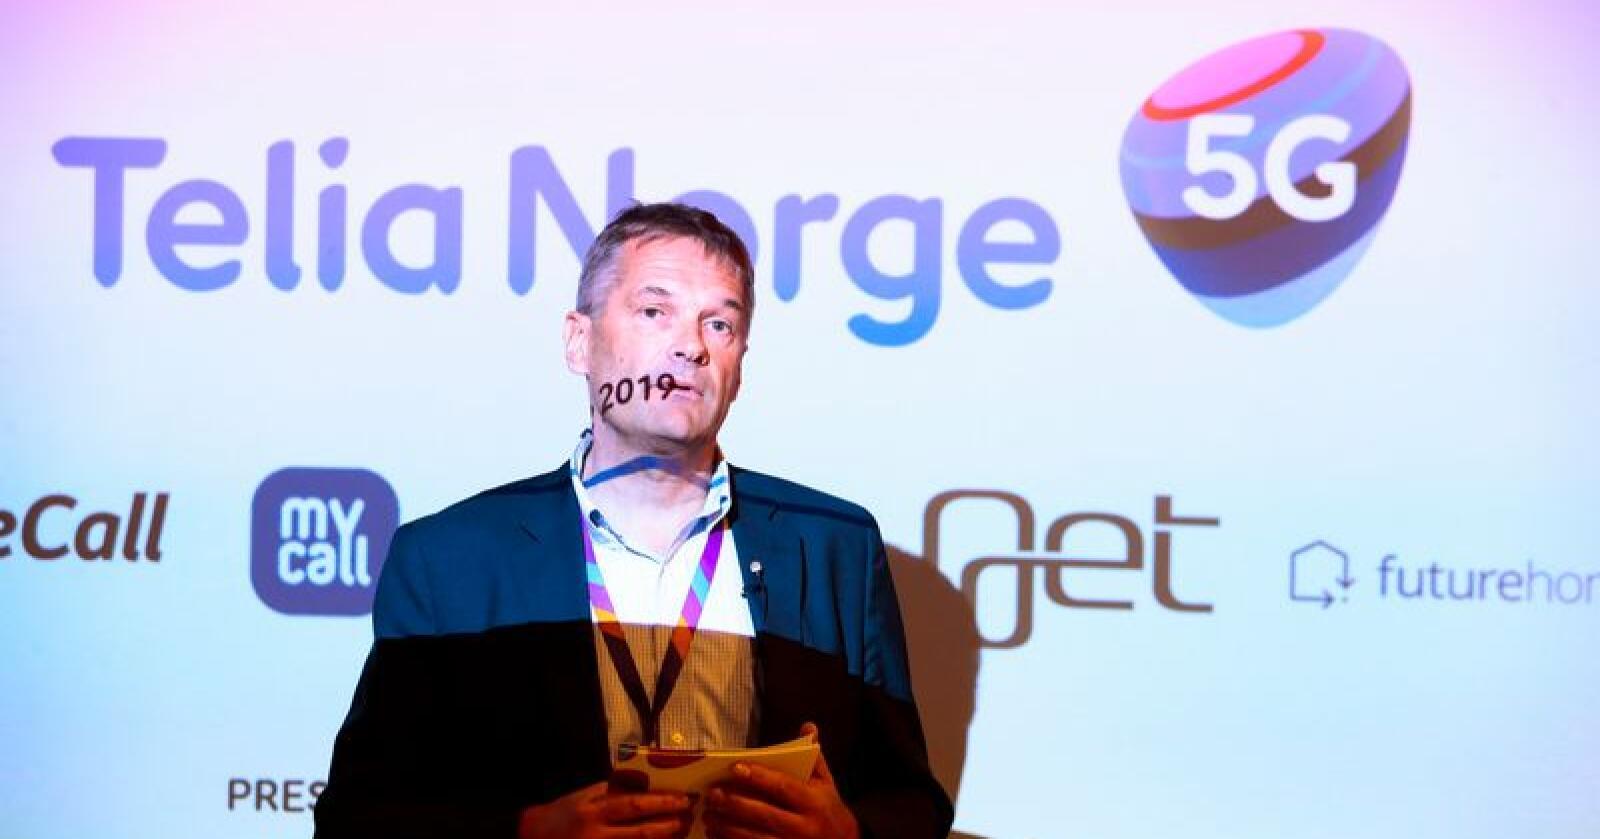 Administrerende direktør Abraham Foss i Telia Norge under pressekonferansen om 5G-teknologi i Telias lokaler i Nydalen i Oslo tirsdag. Foto: Håkon Mosvold Larsen / NTB scanpix